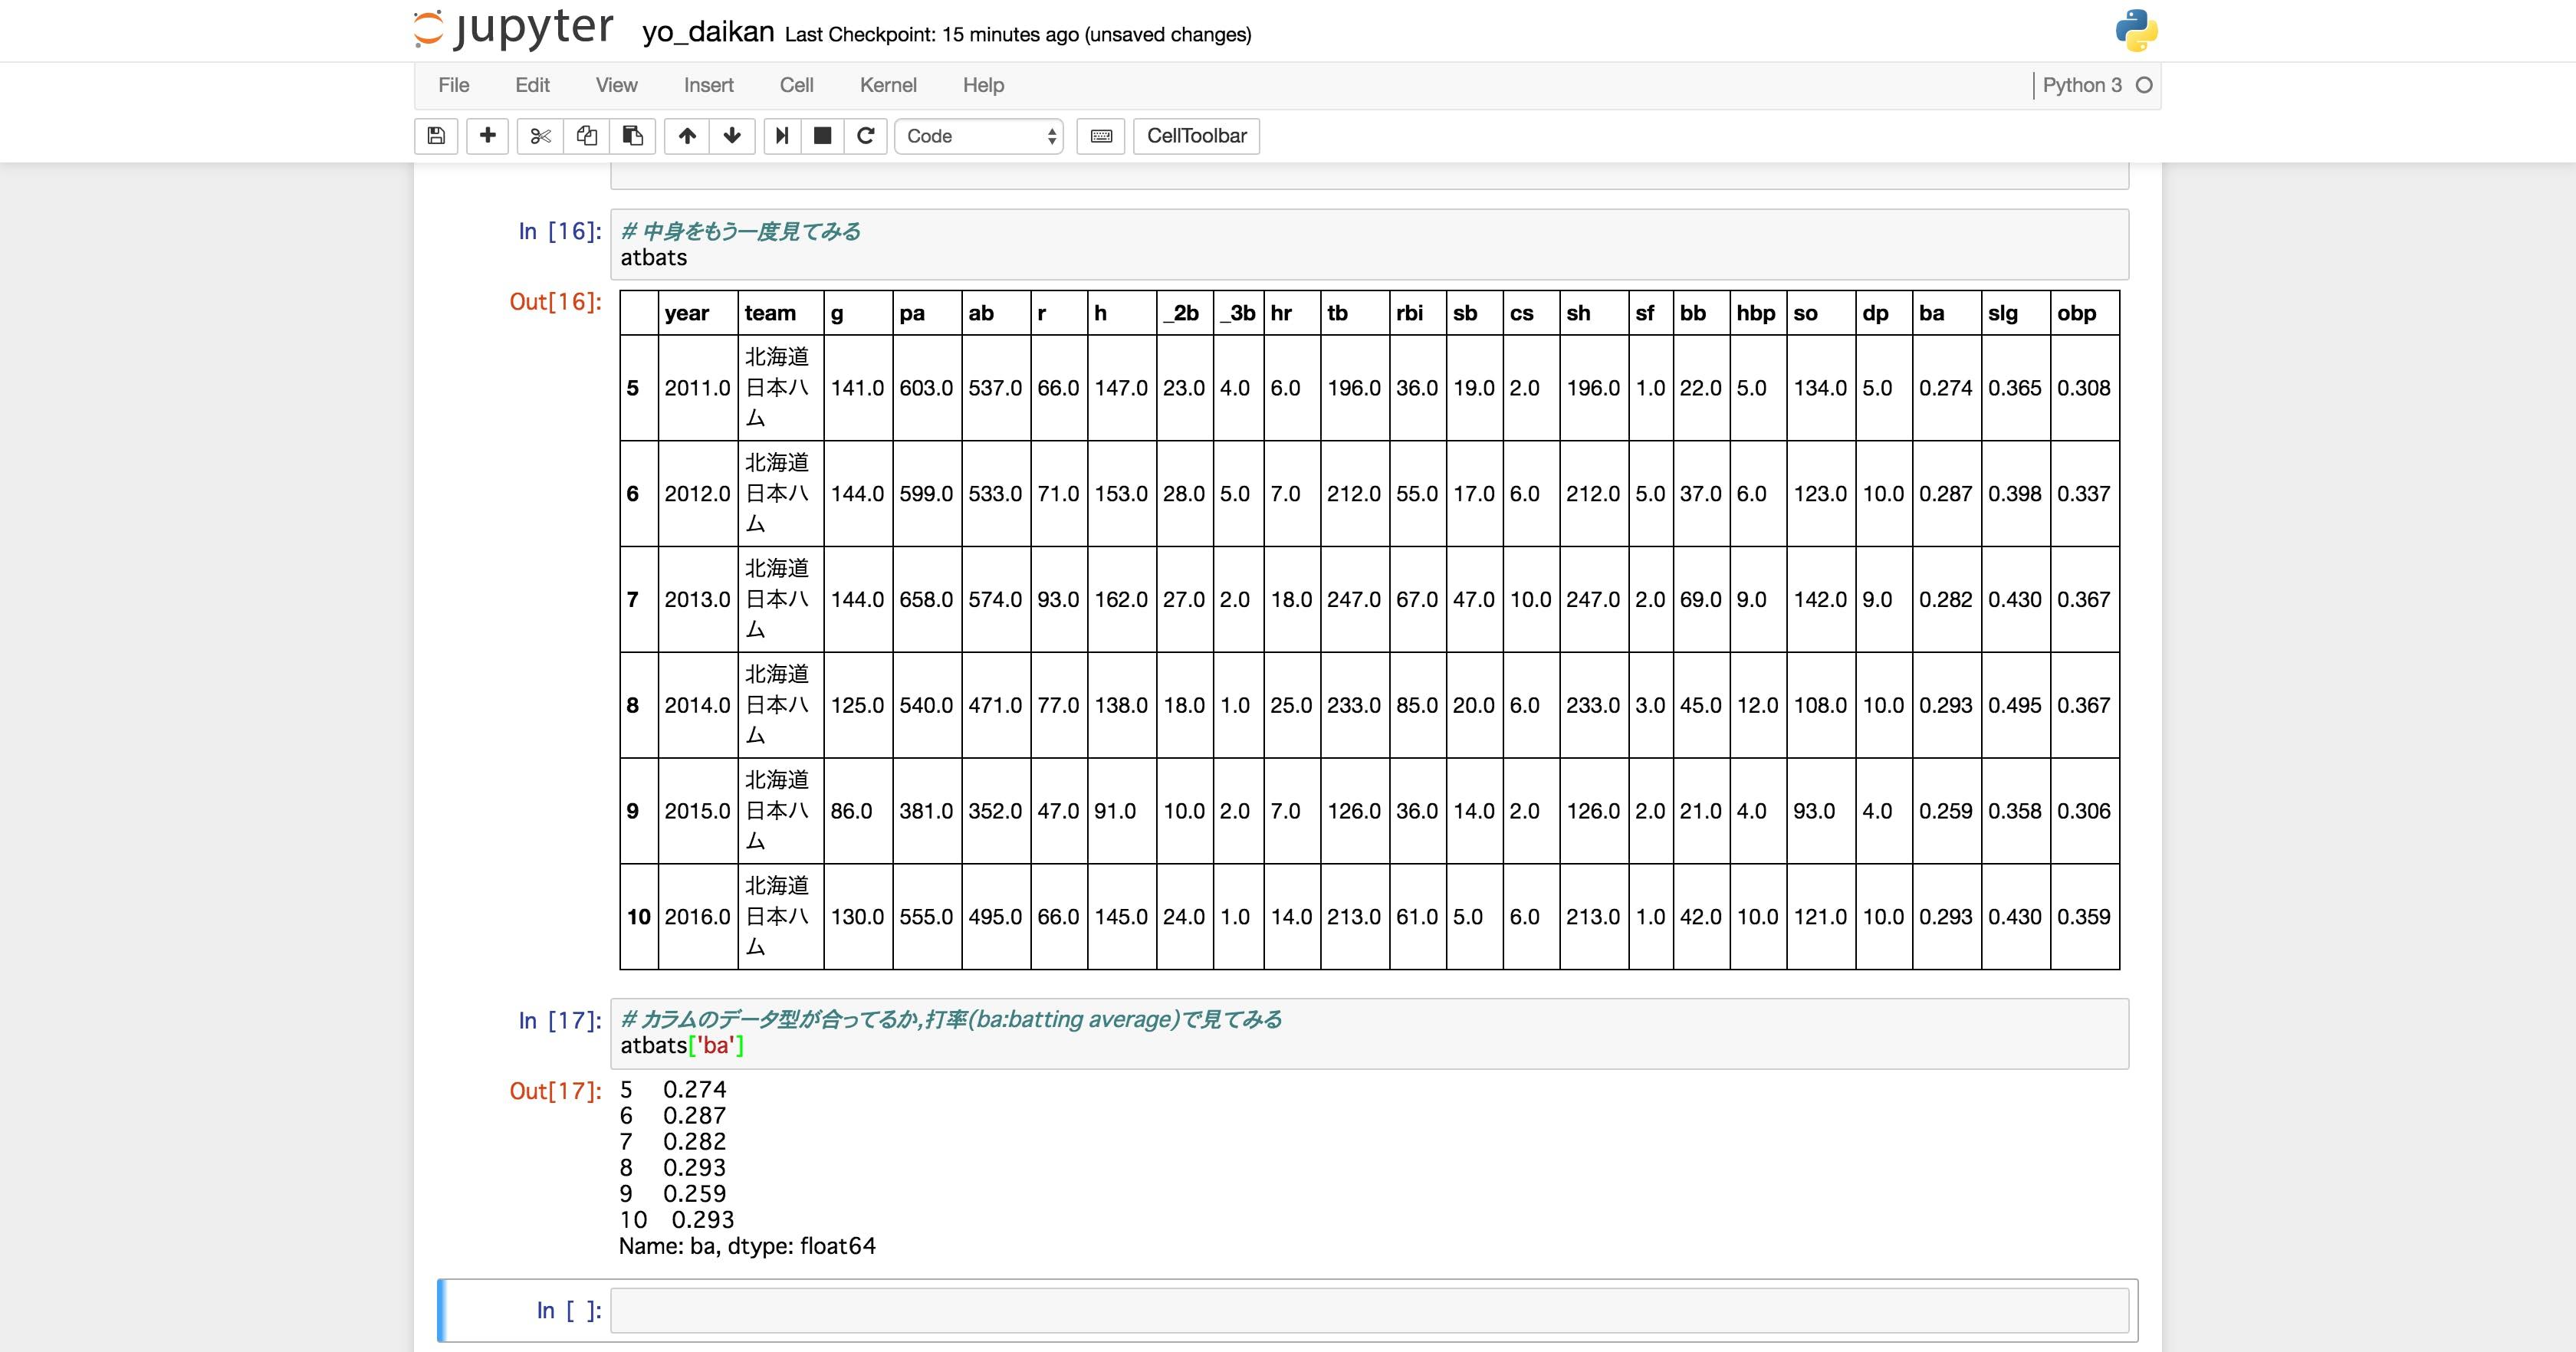 FireShot Capture 5 - yo_daikan - http___localhost_8888_notebooks_yo_daikan.ipynb.png